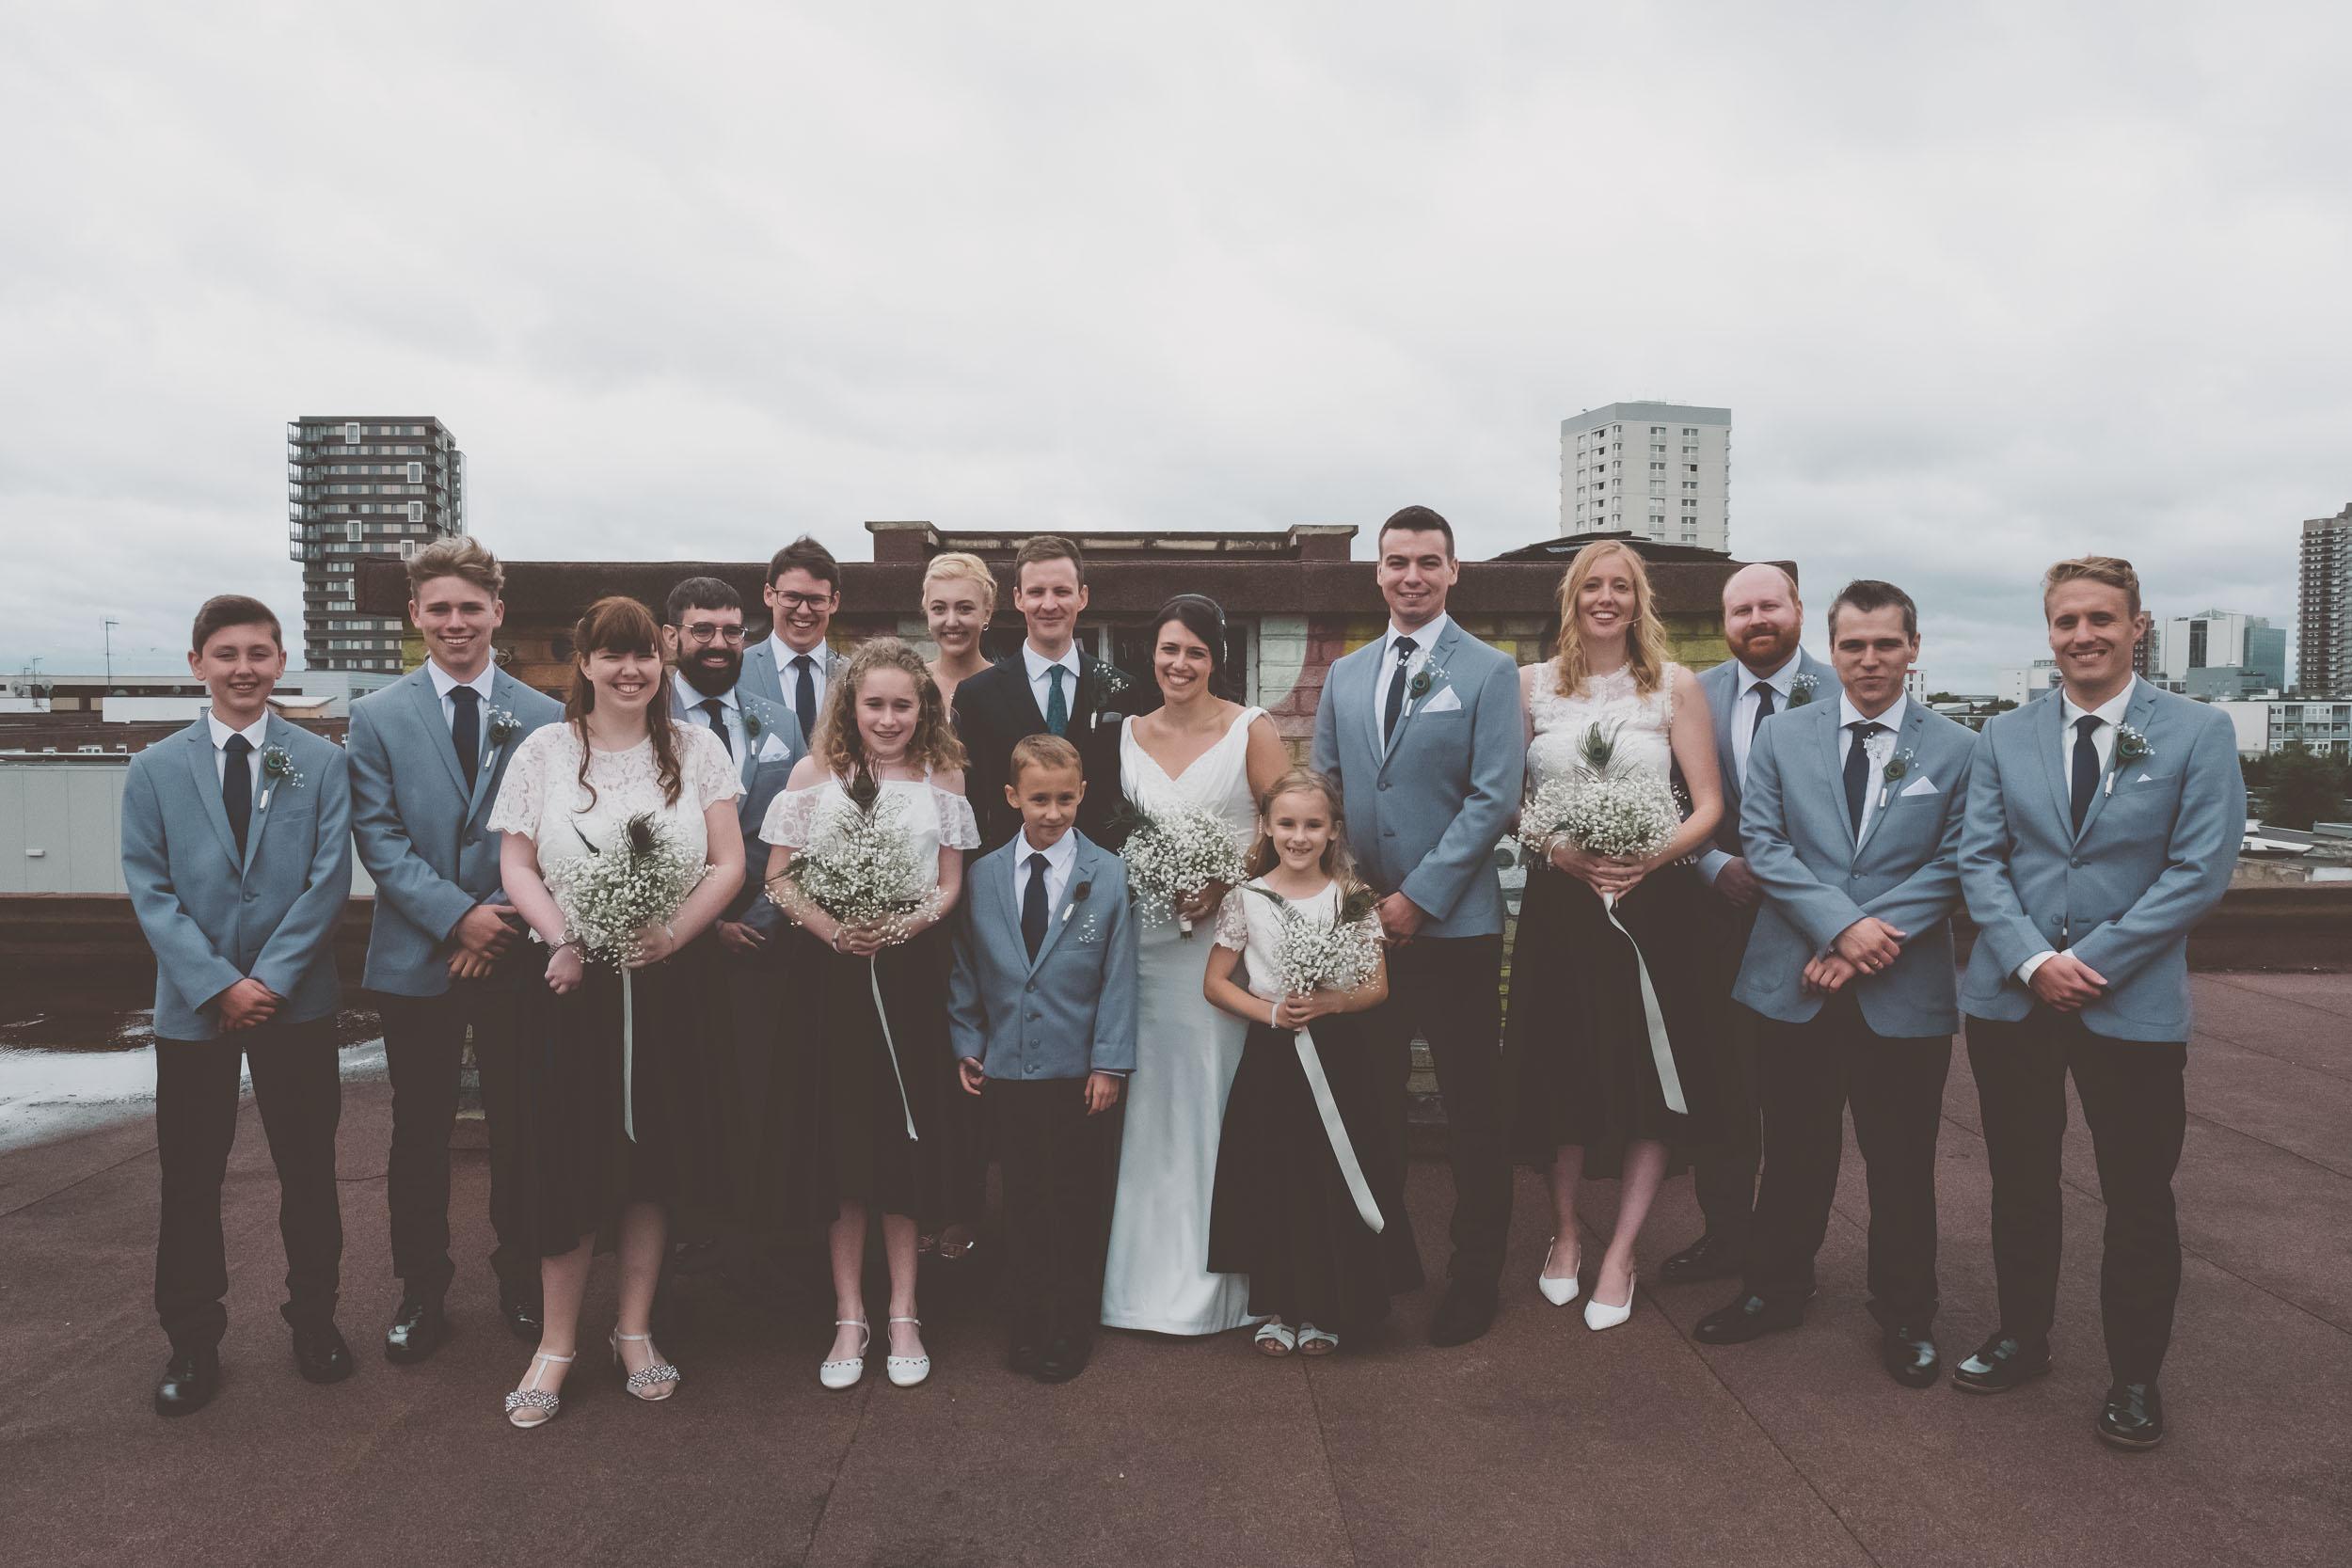 islington-town-hall-4th-floor-studios-wedding264.jpg